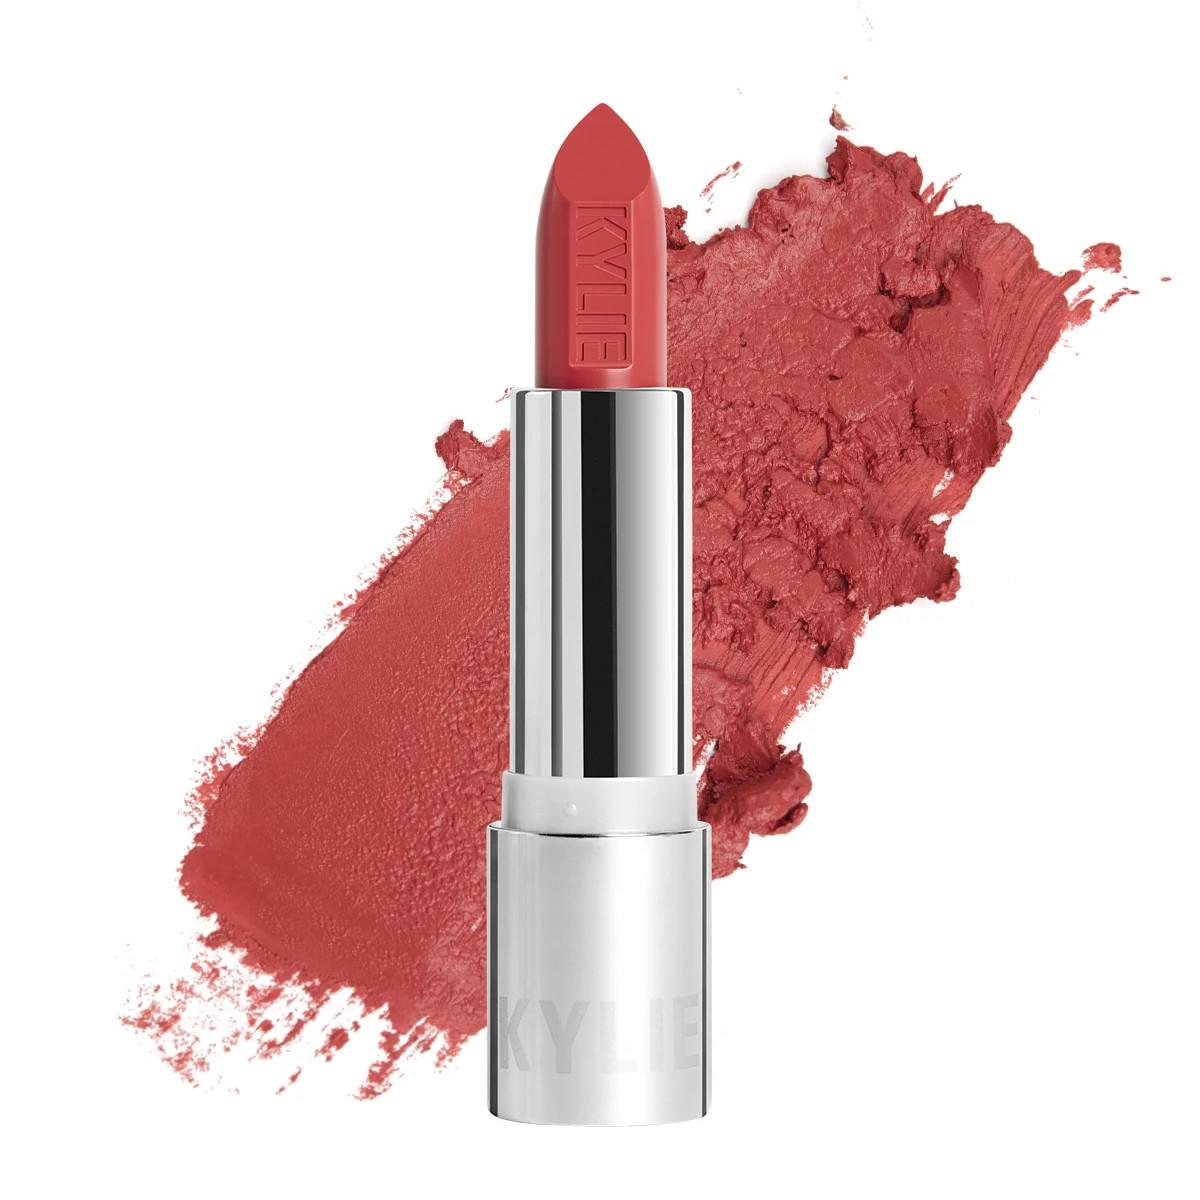 Kylie Cosmetics Creme Lipstick Crush